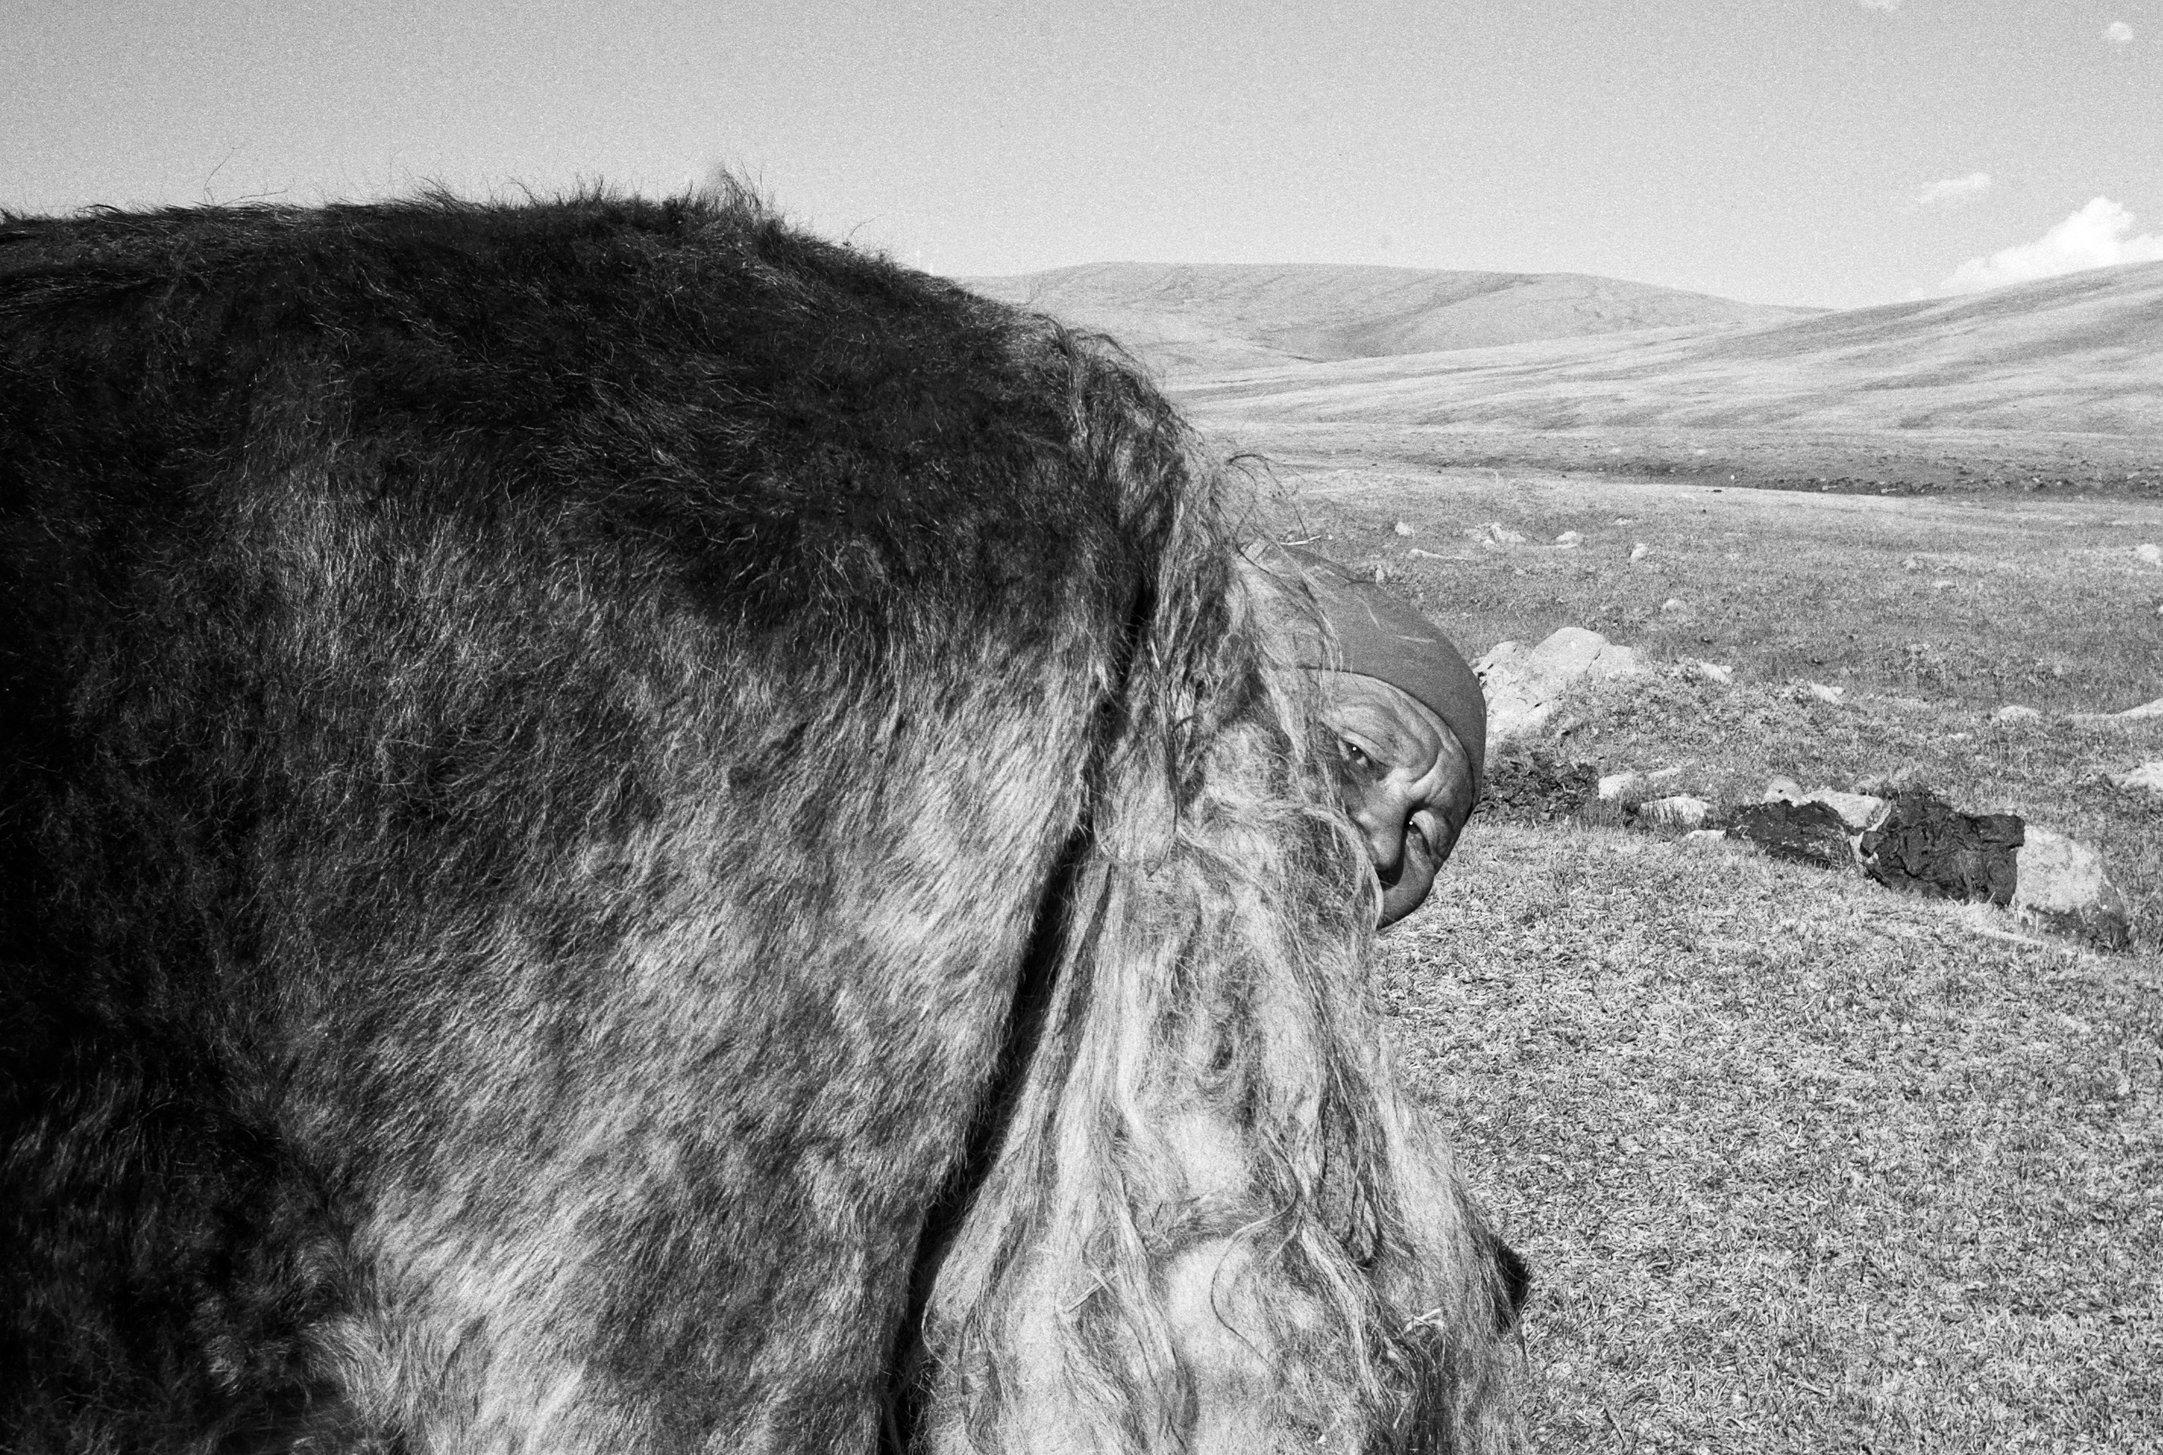 Khuk Khutel, Mongolia, 2009